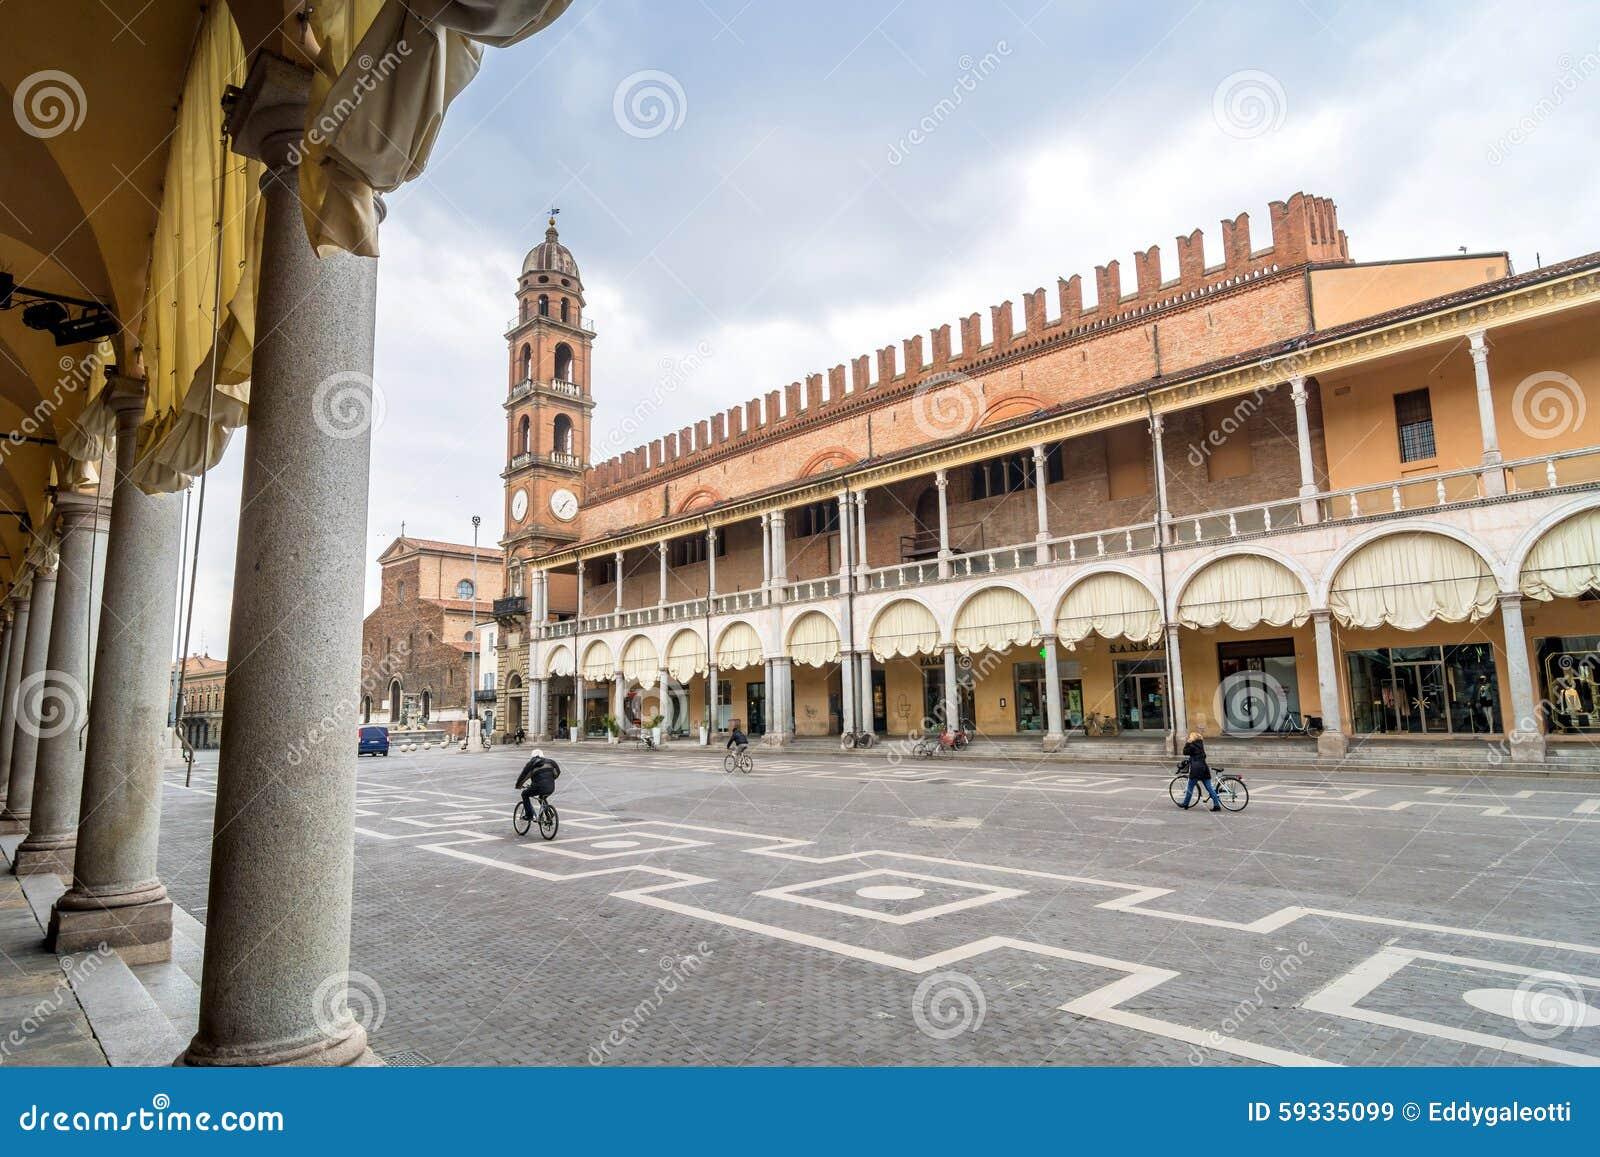 Piazza del popolo dans faenza italie image stock for Dans italien